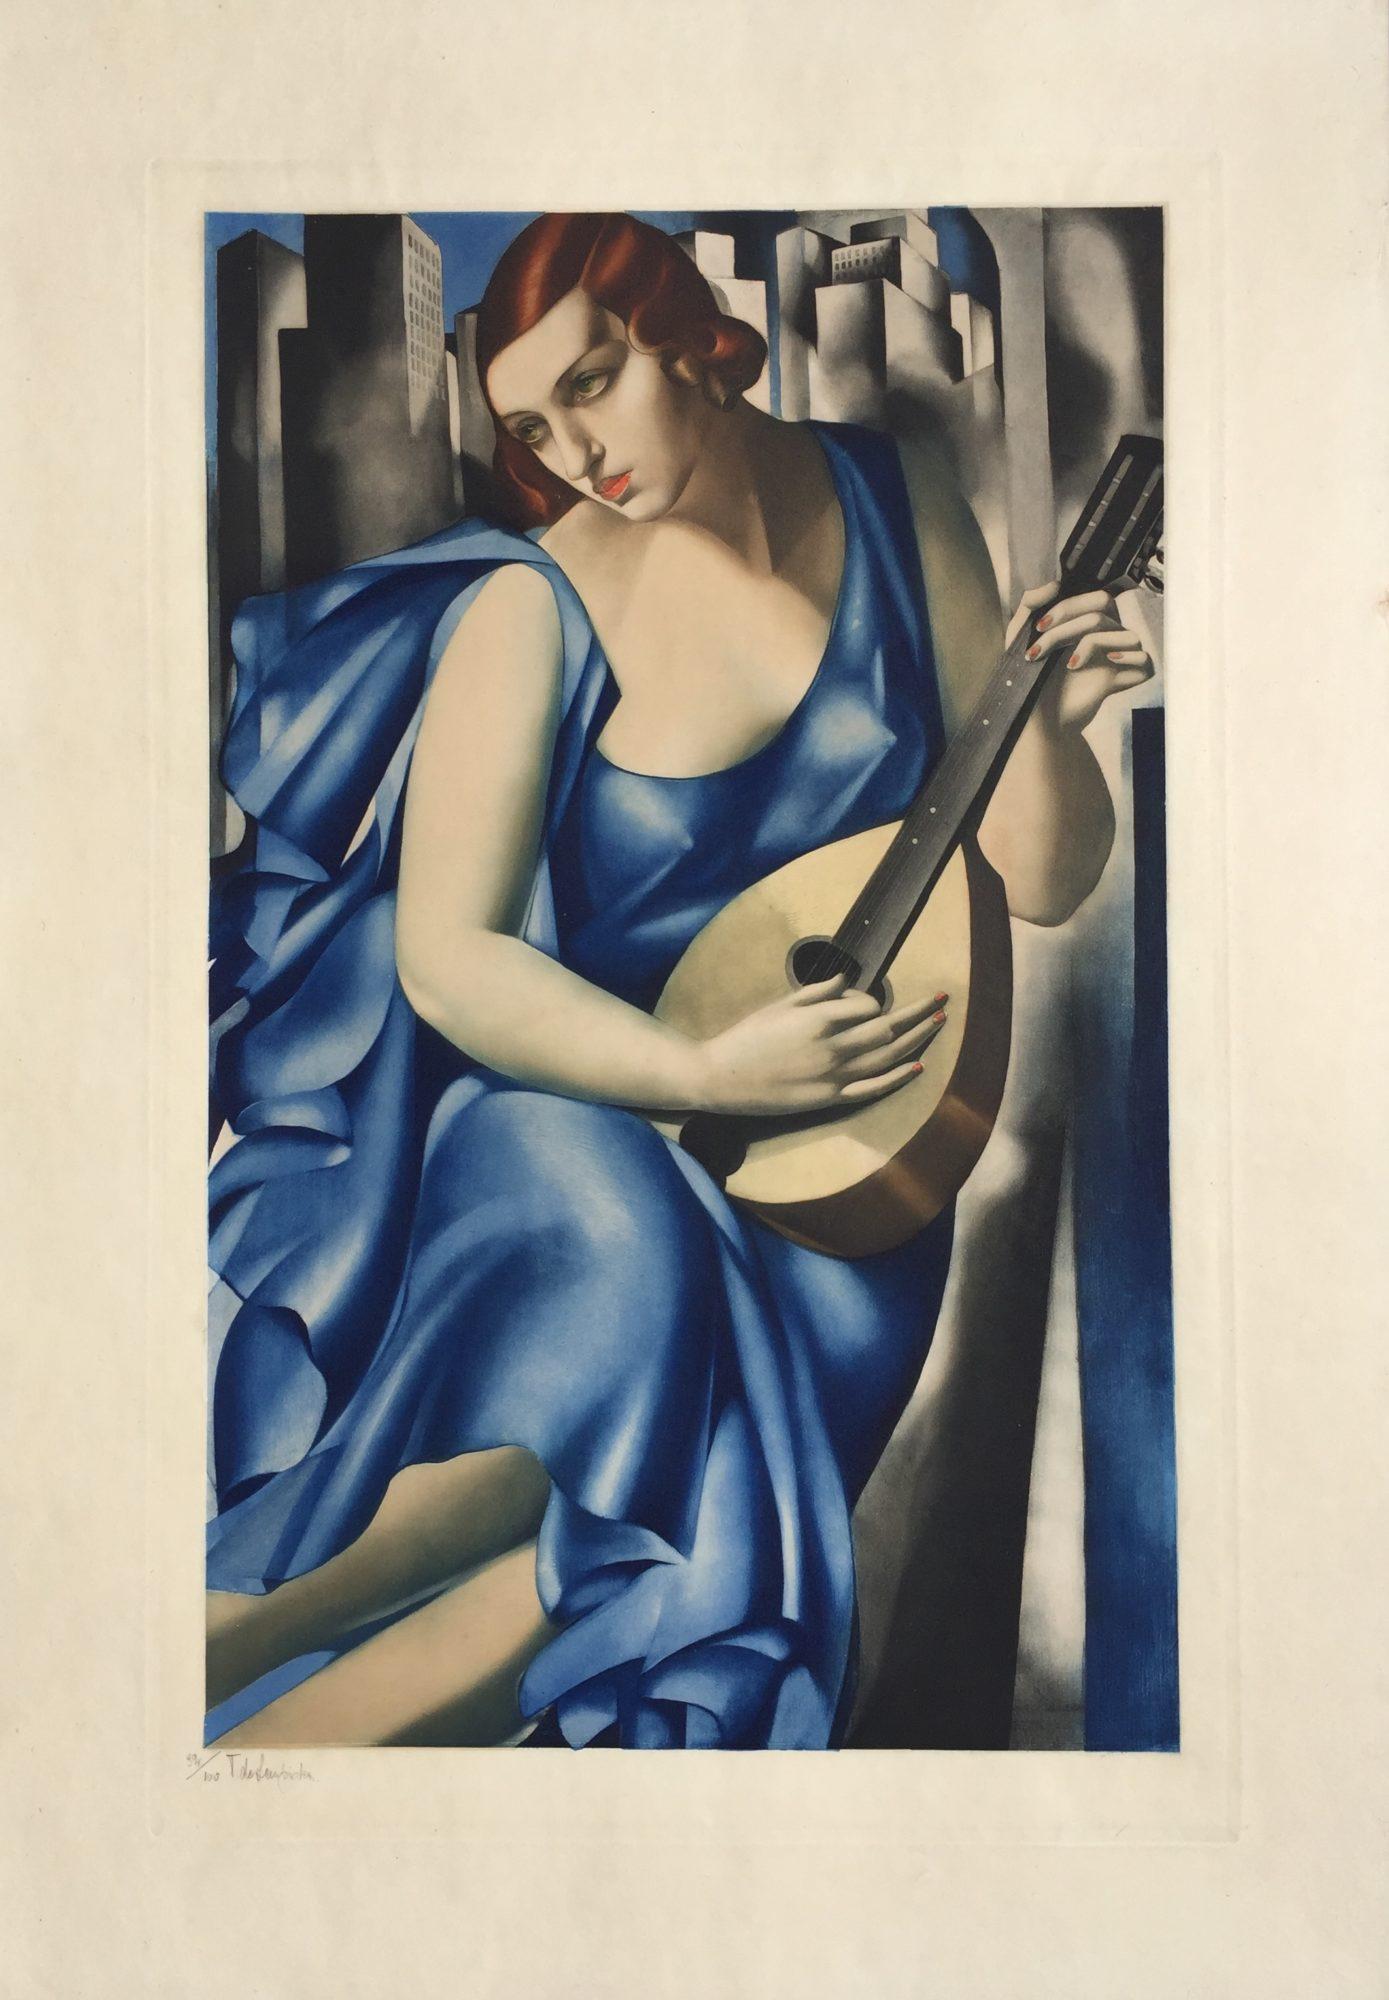 Tamara de Lempicka - Femme a la Mandoline (Woman with Mandoline)